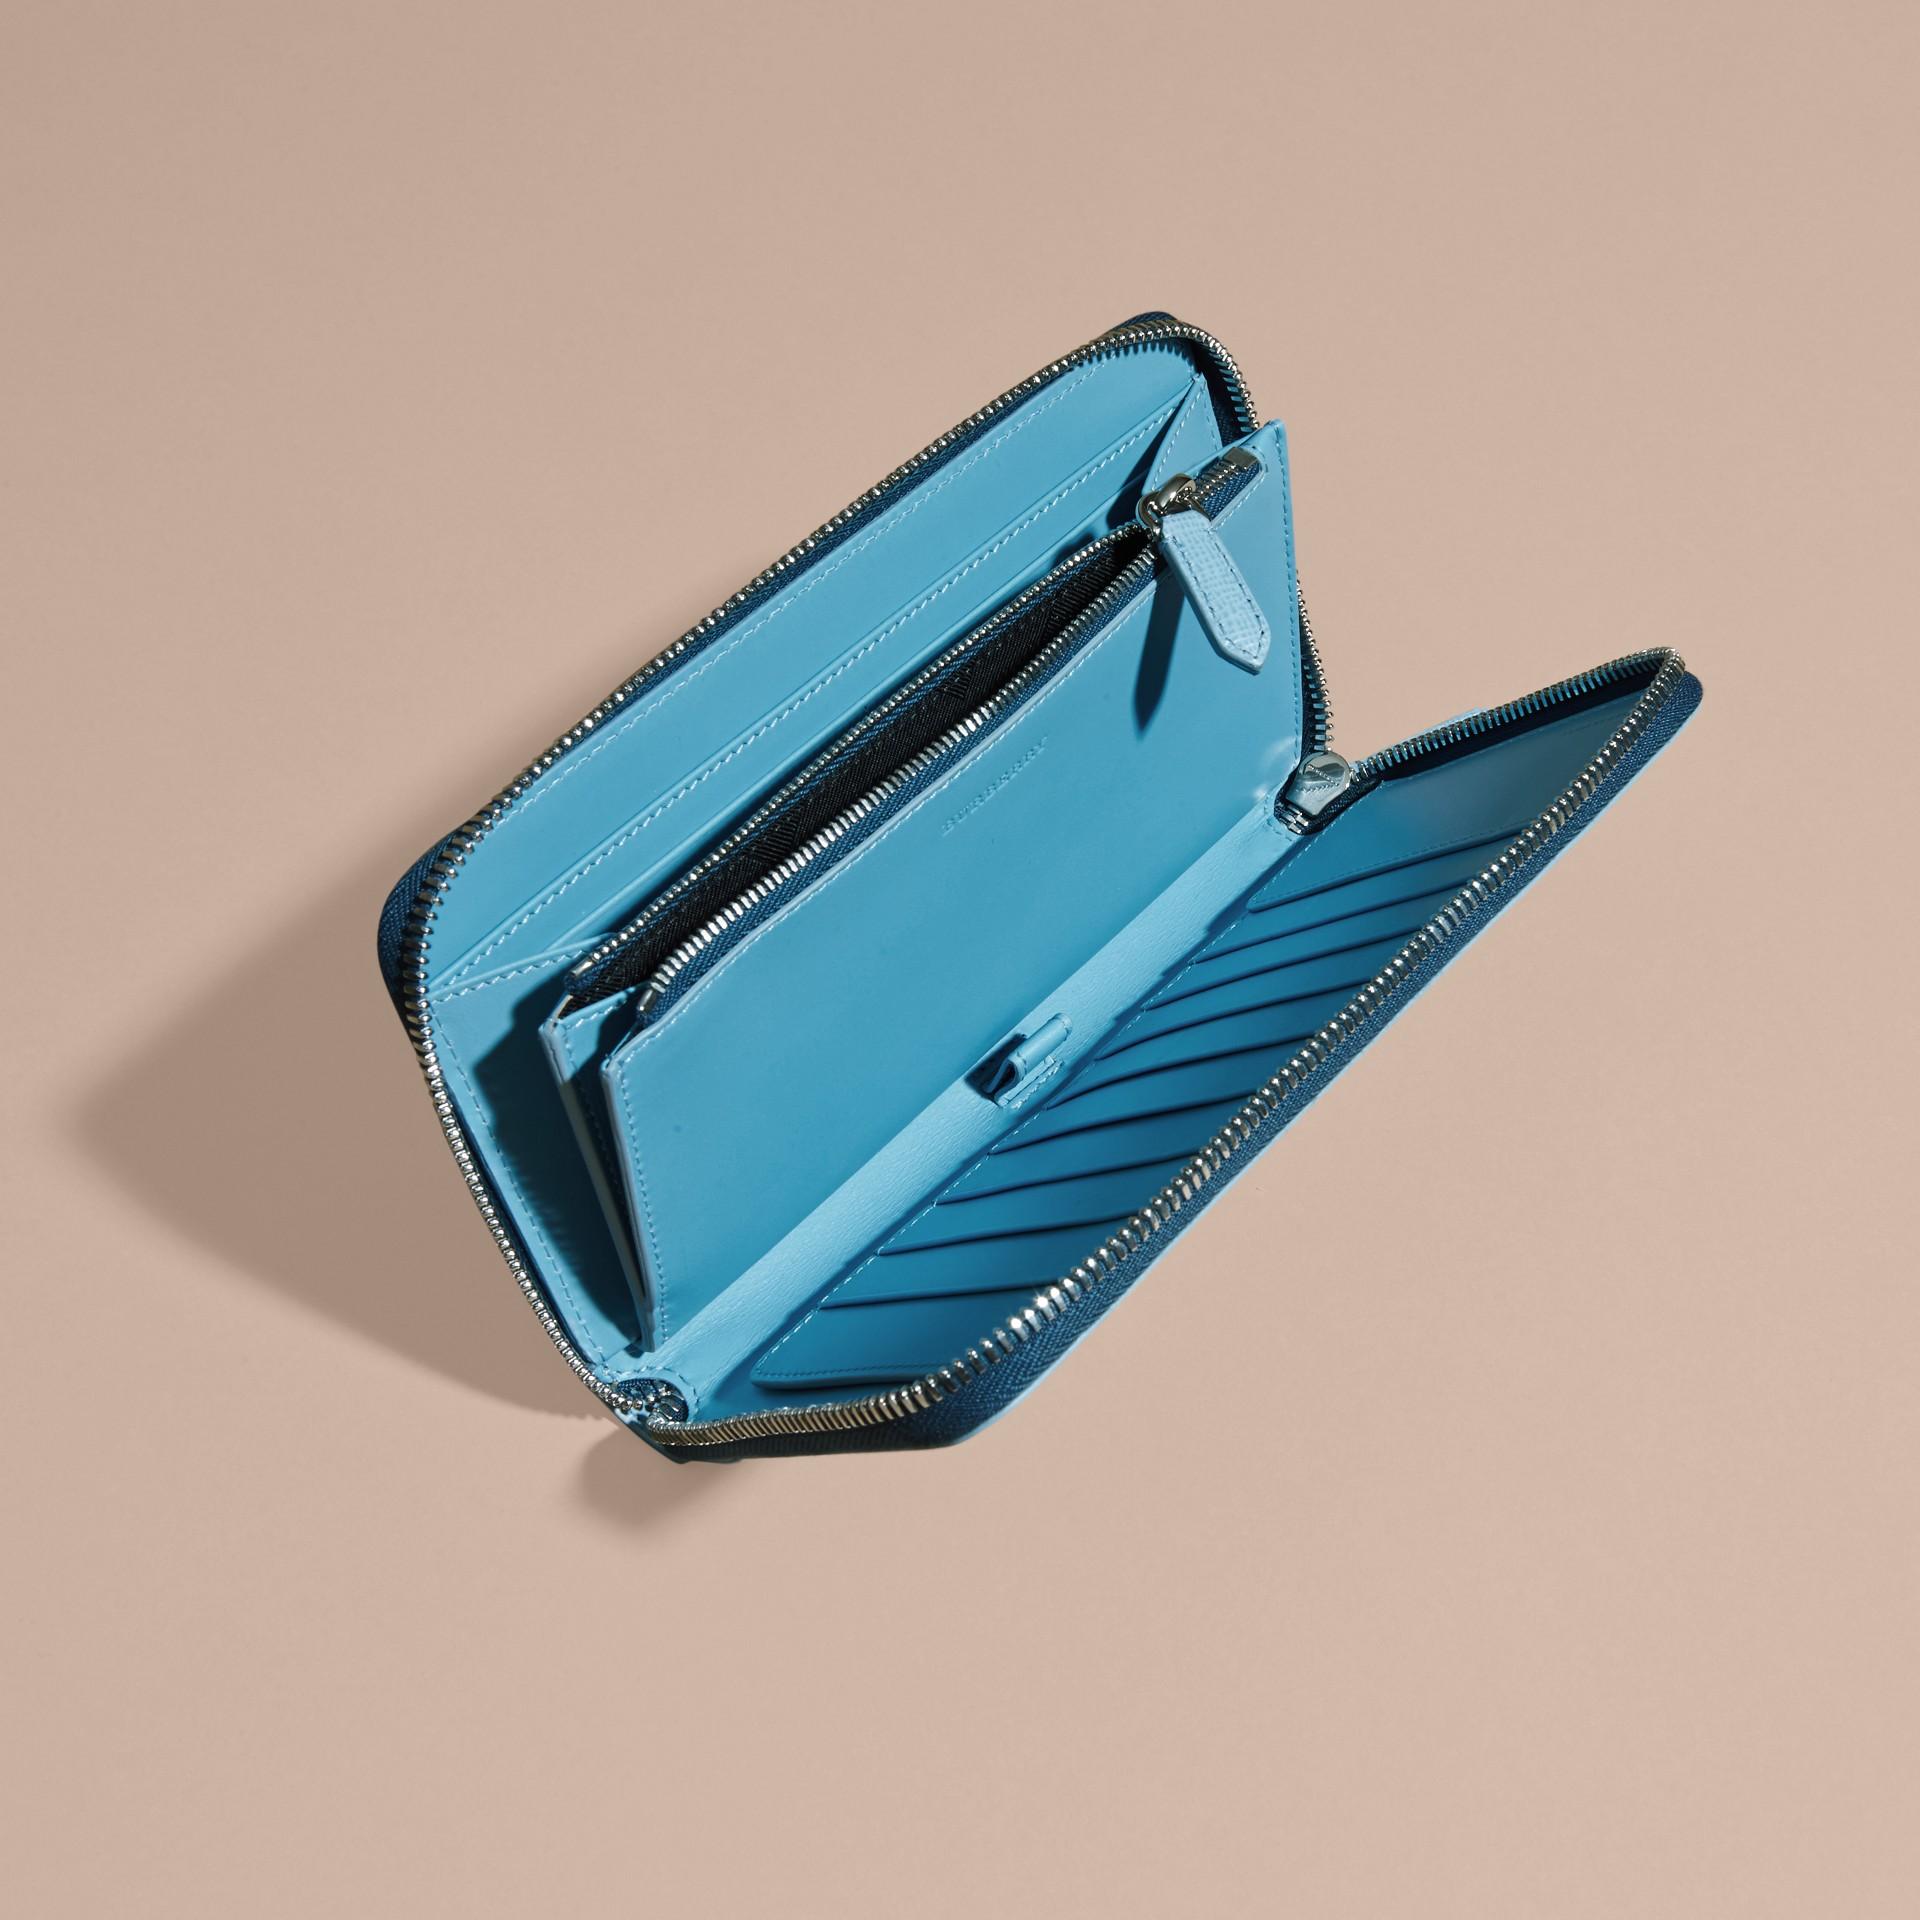 London Leather Ziparound Wallet Powder Blue - gallery image 6